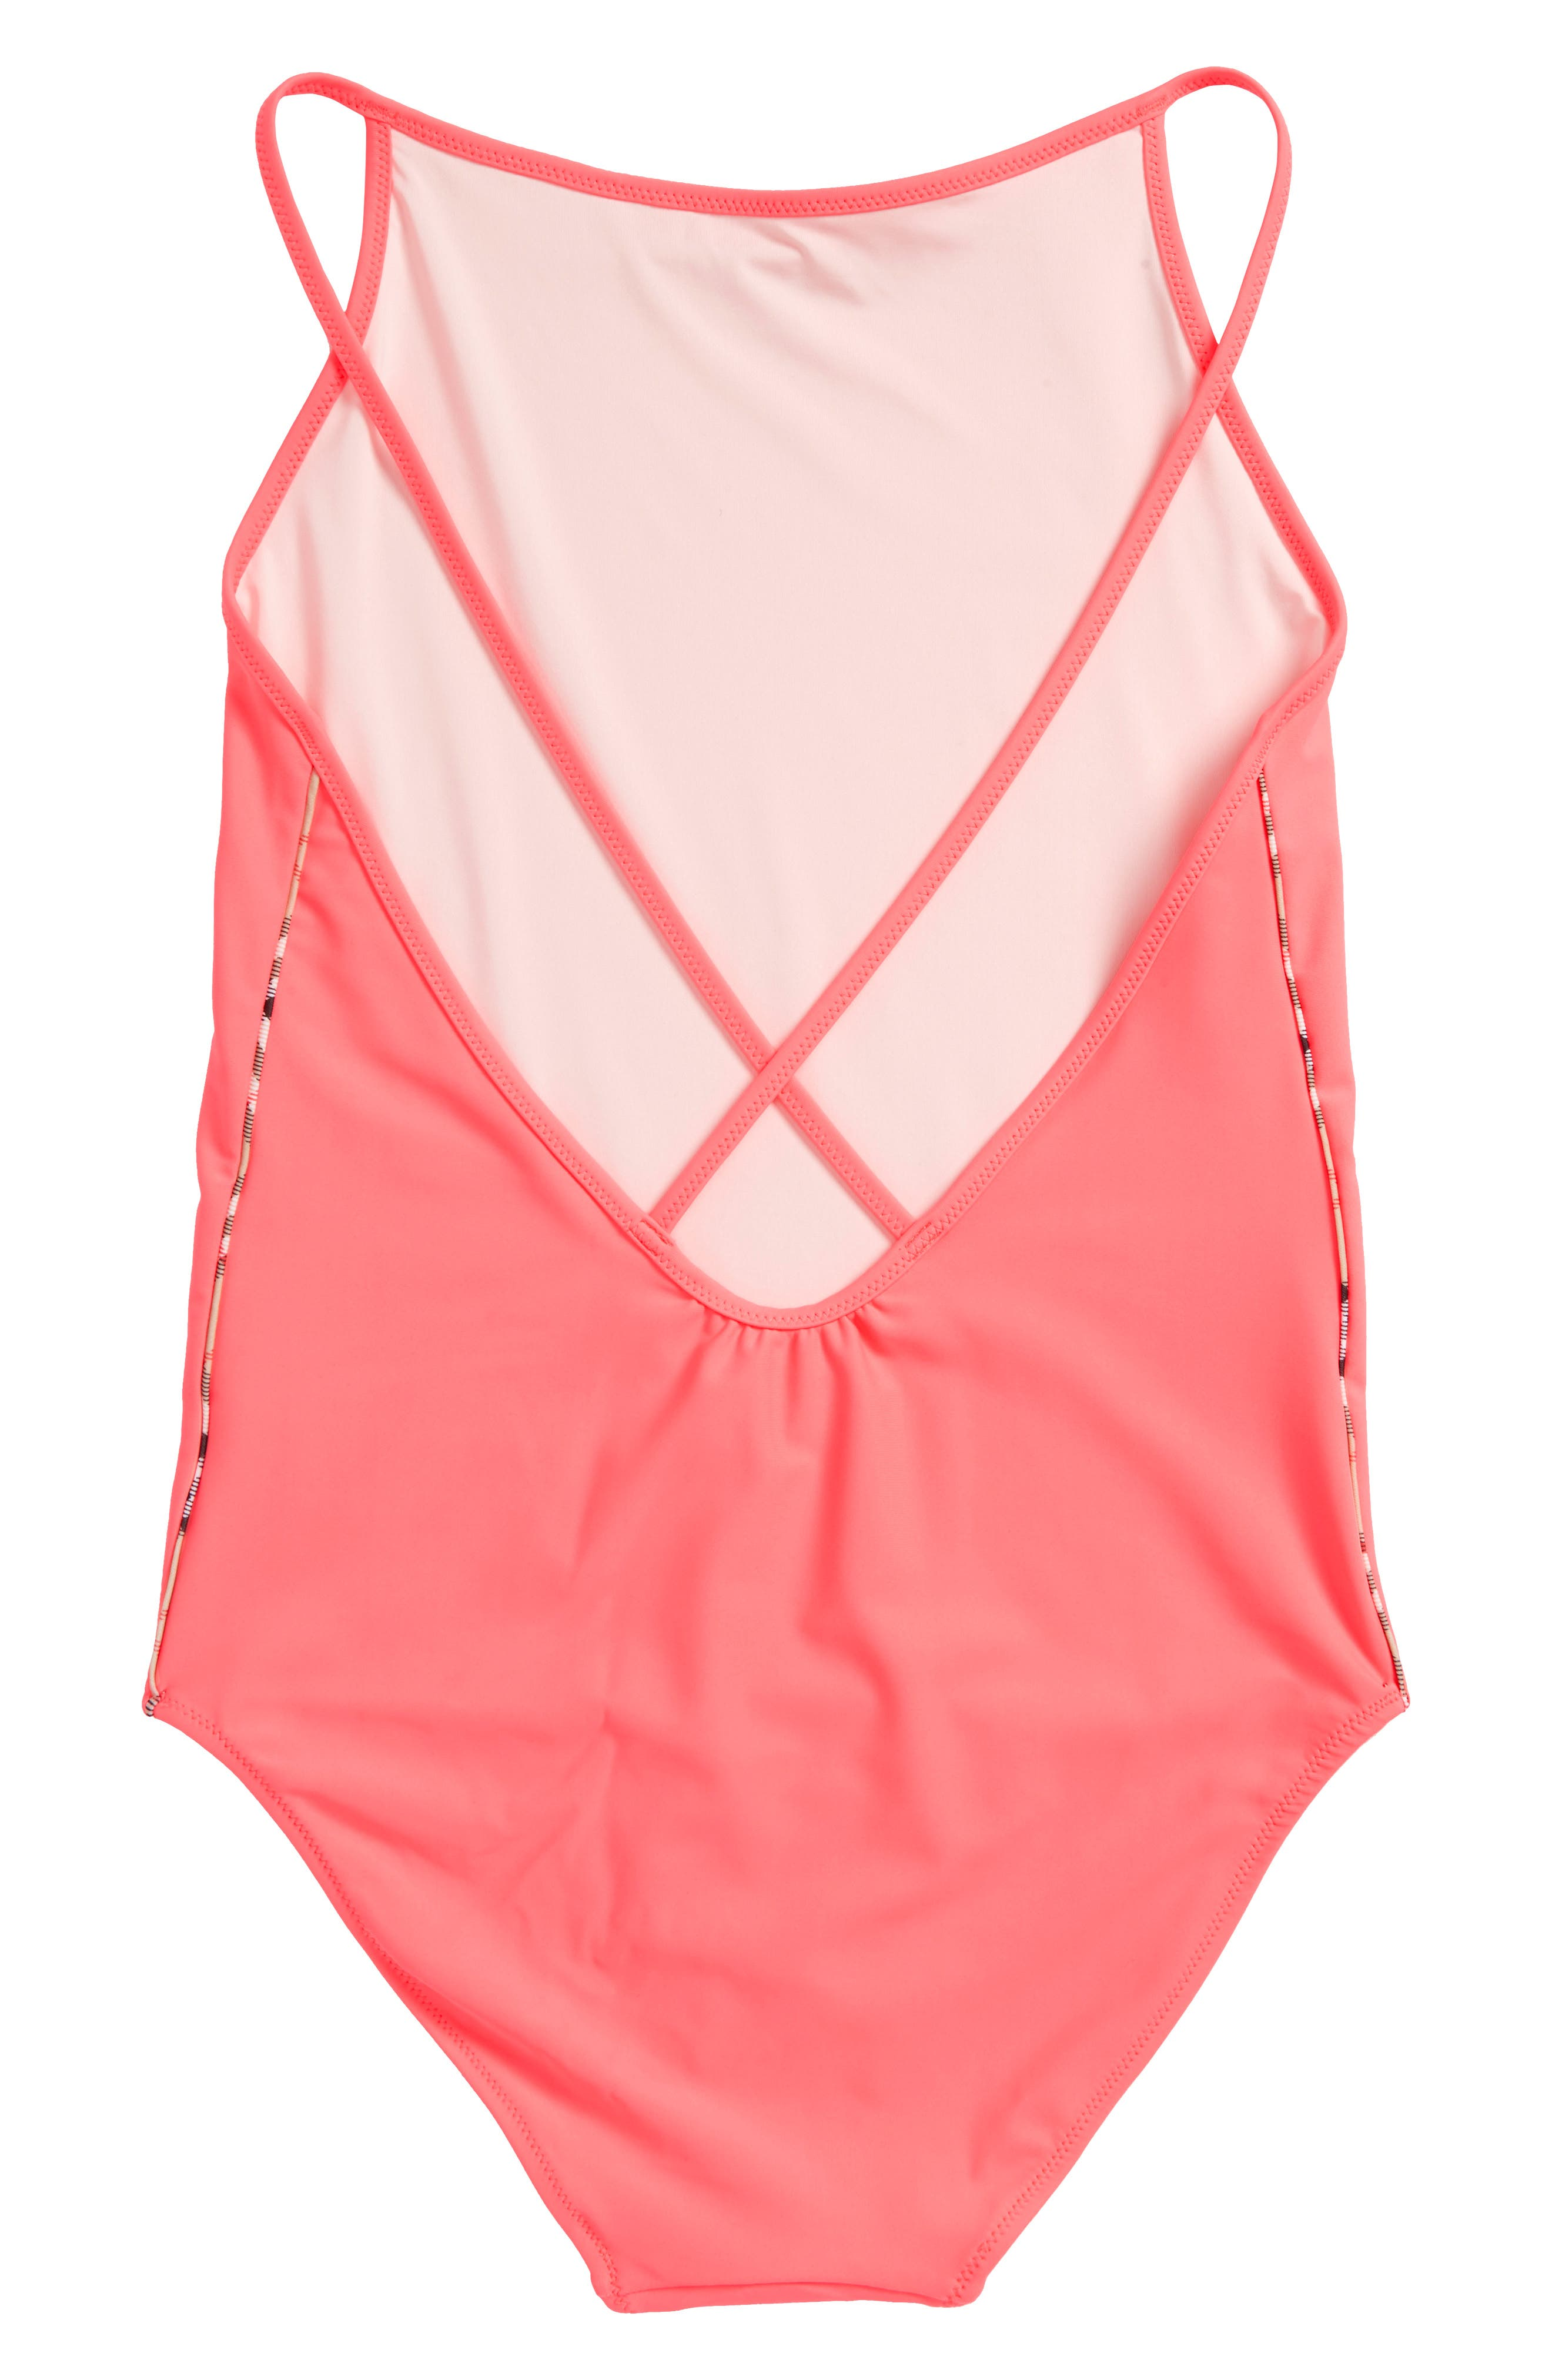 Sandine One-Piece Swimsuit,                             Alternate thumbnail 2, color,                             950